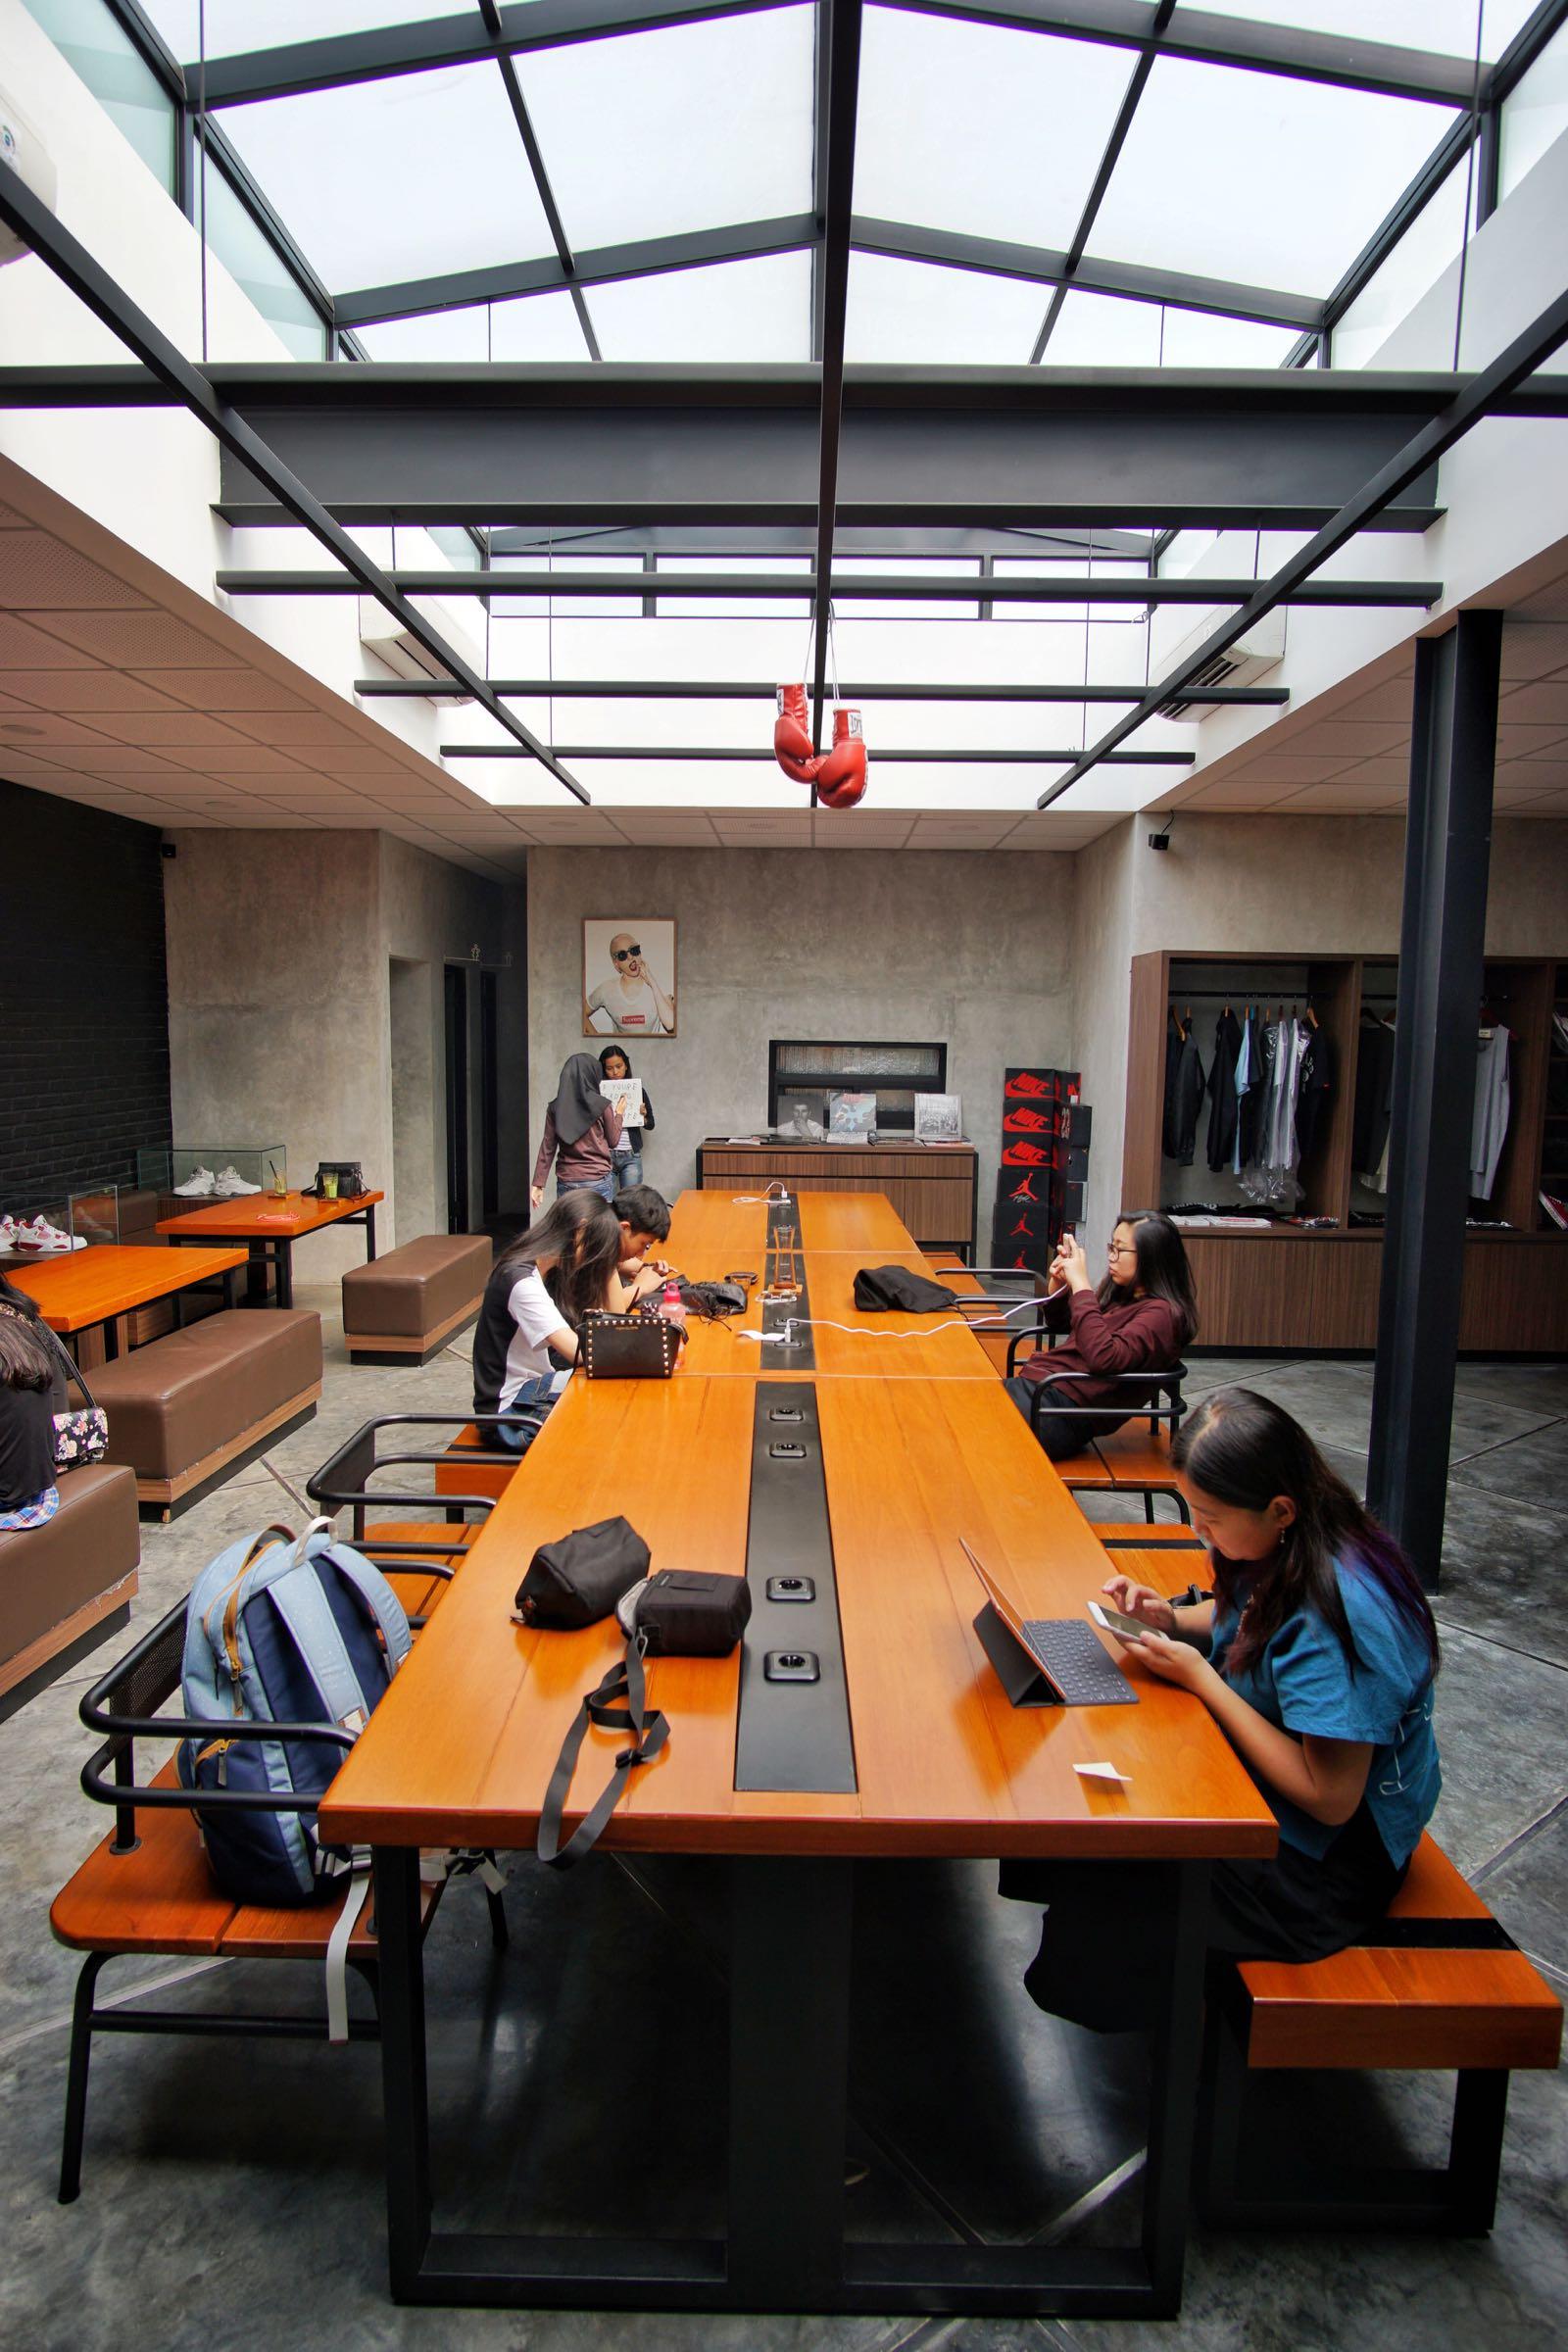 Ruckerpark Bandung work area